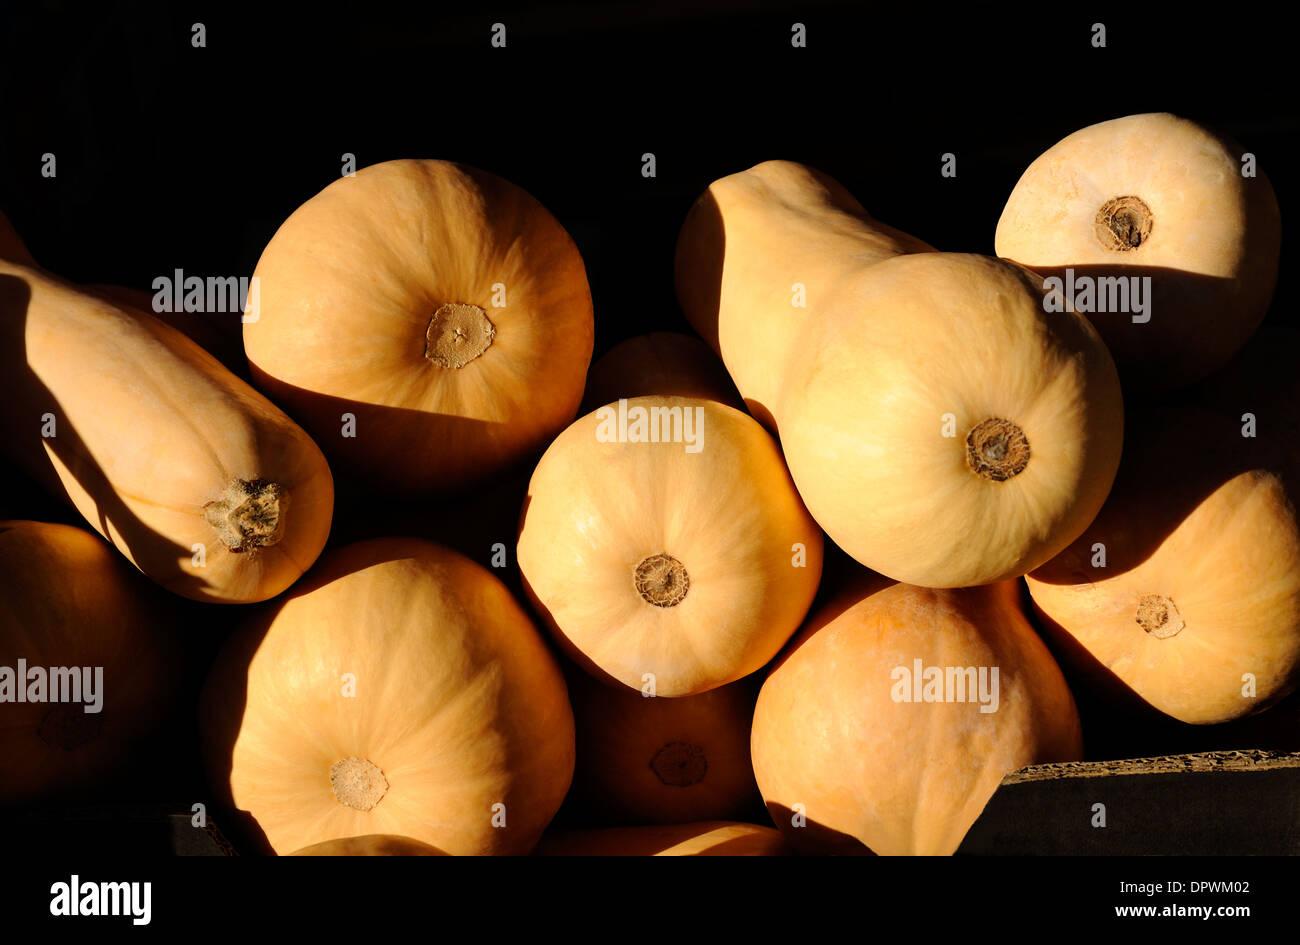 Calabacita Imagen De Stock